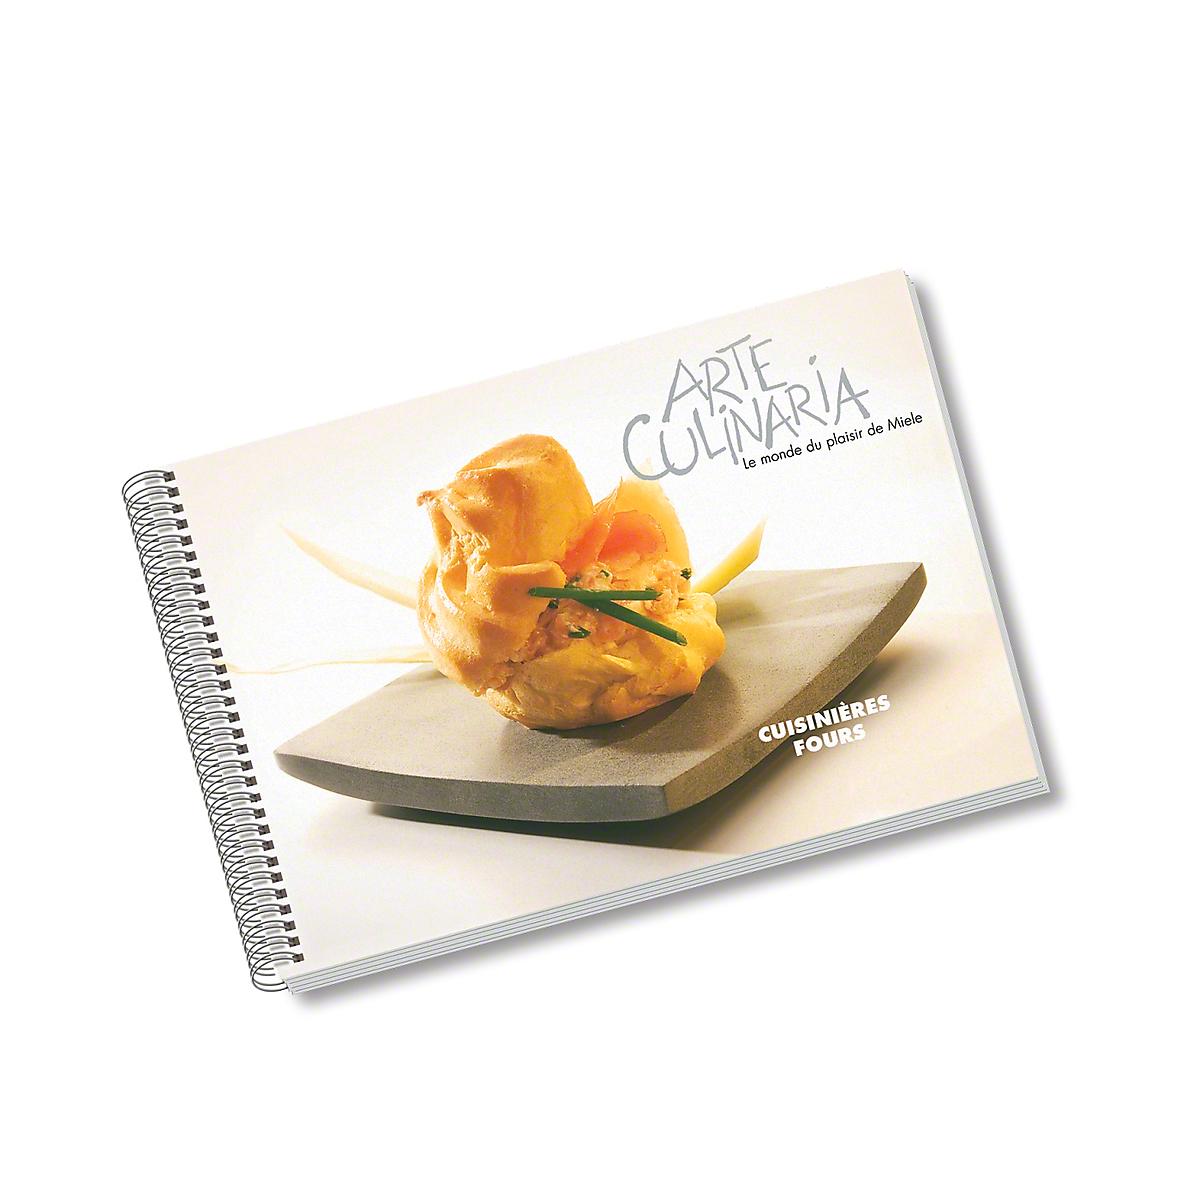 miele kbhb1 livre de cuisine cuisini res fours. Black Bedroom Furniture Sets. Home Design Ideas